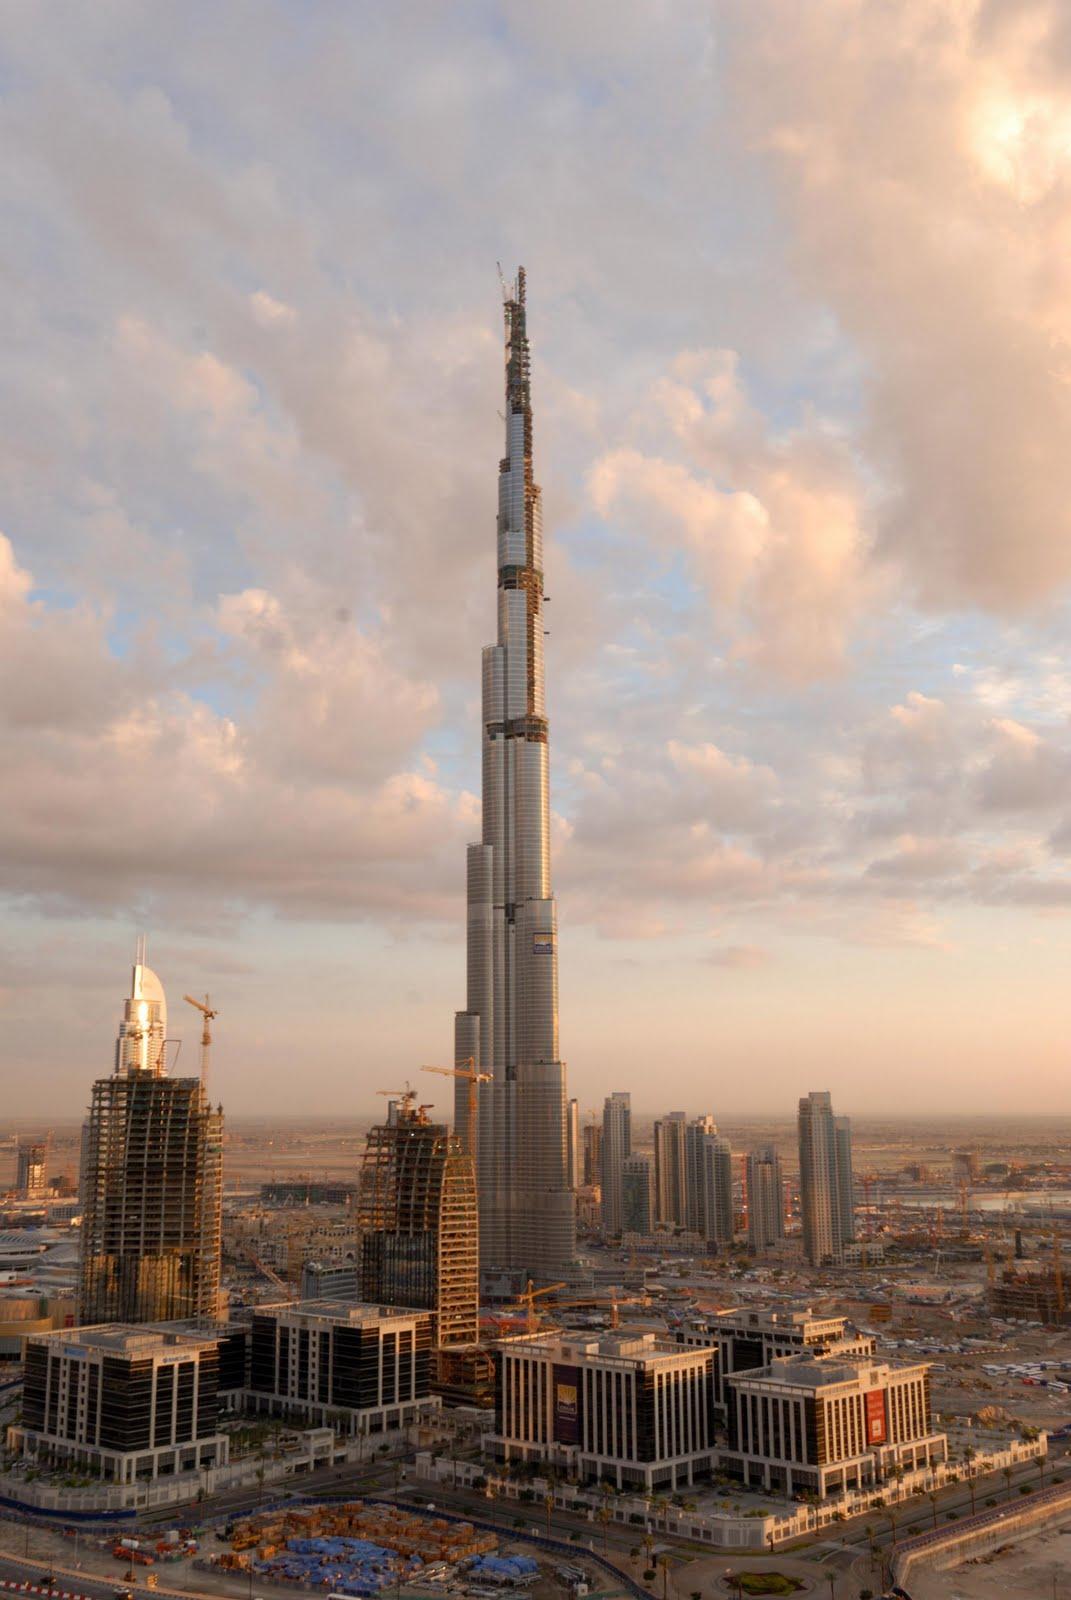 http://2.bp.blogspot.com/-k5p1D6S_F_k/Tc4TyJciY9I/AAAAAAAACj0/06Wrcbn9_PA/s1600/Burj_Dubai+%252832%2529.jpeg